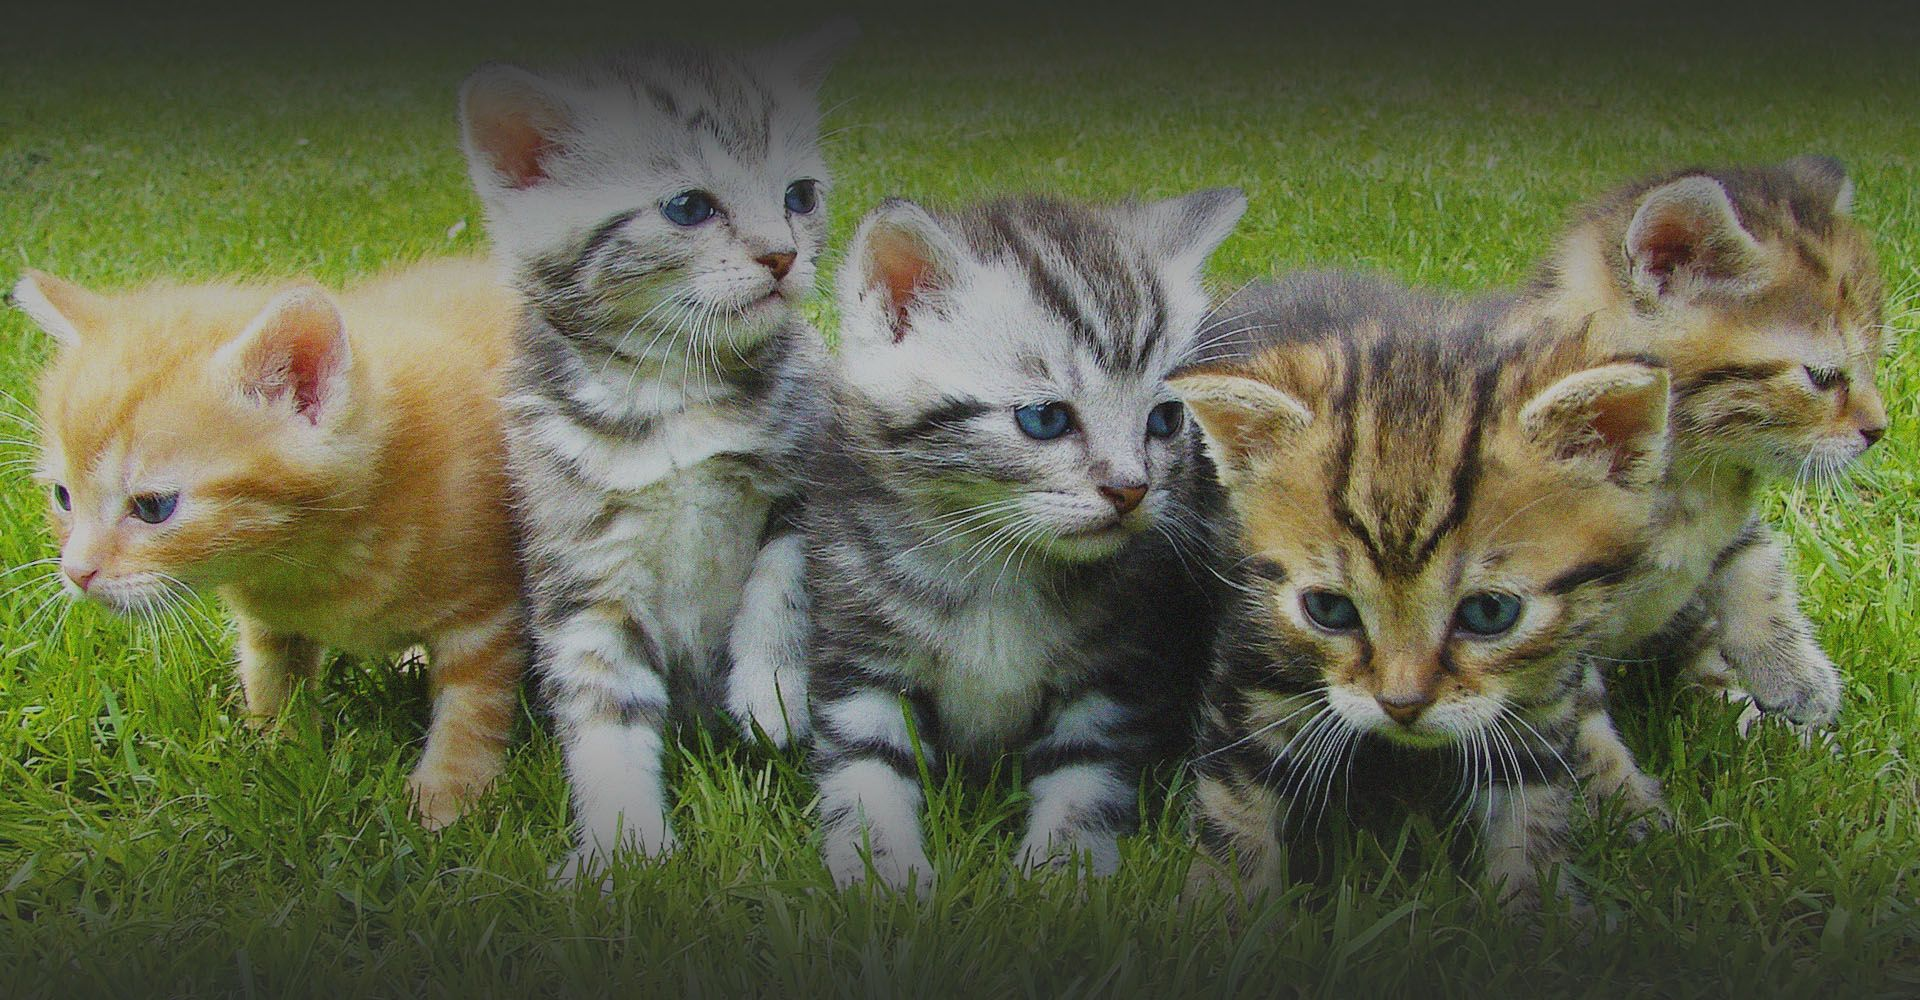 Miami Pet Clinic: Vet in Miami, Little Havana, Allapattah